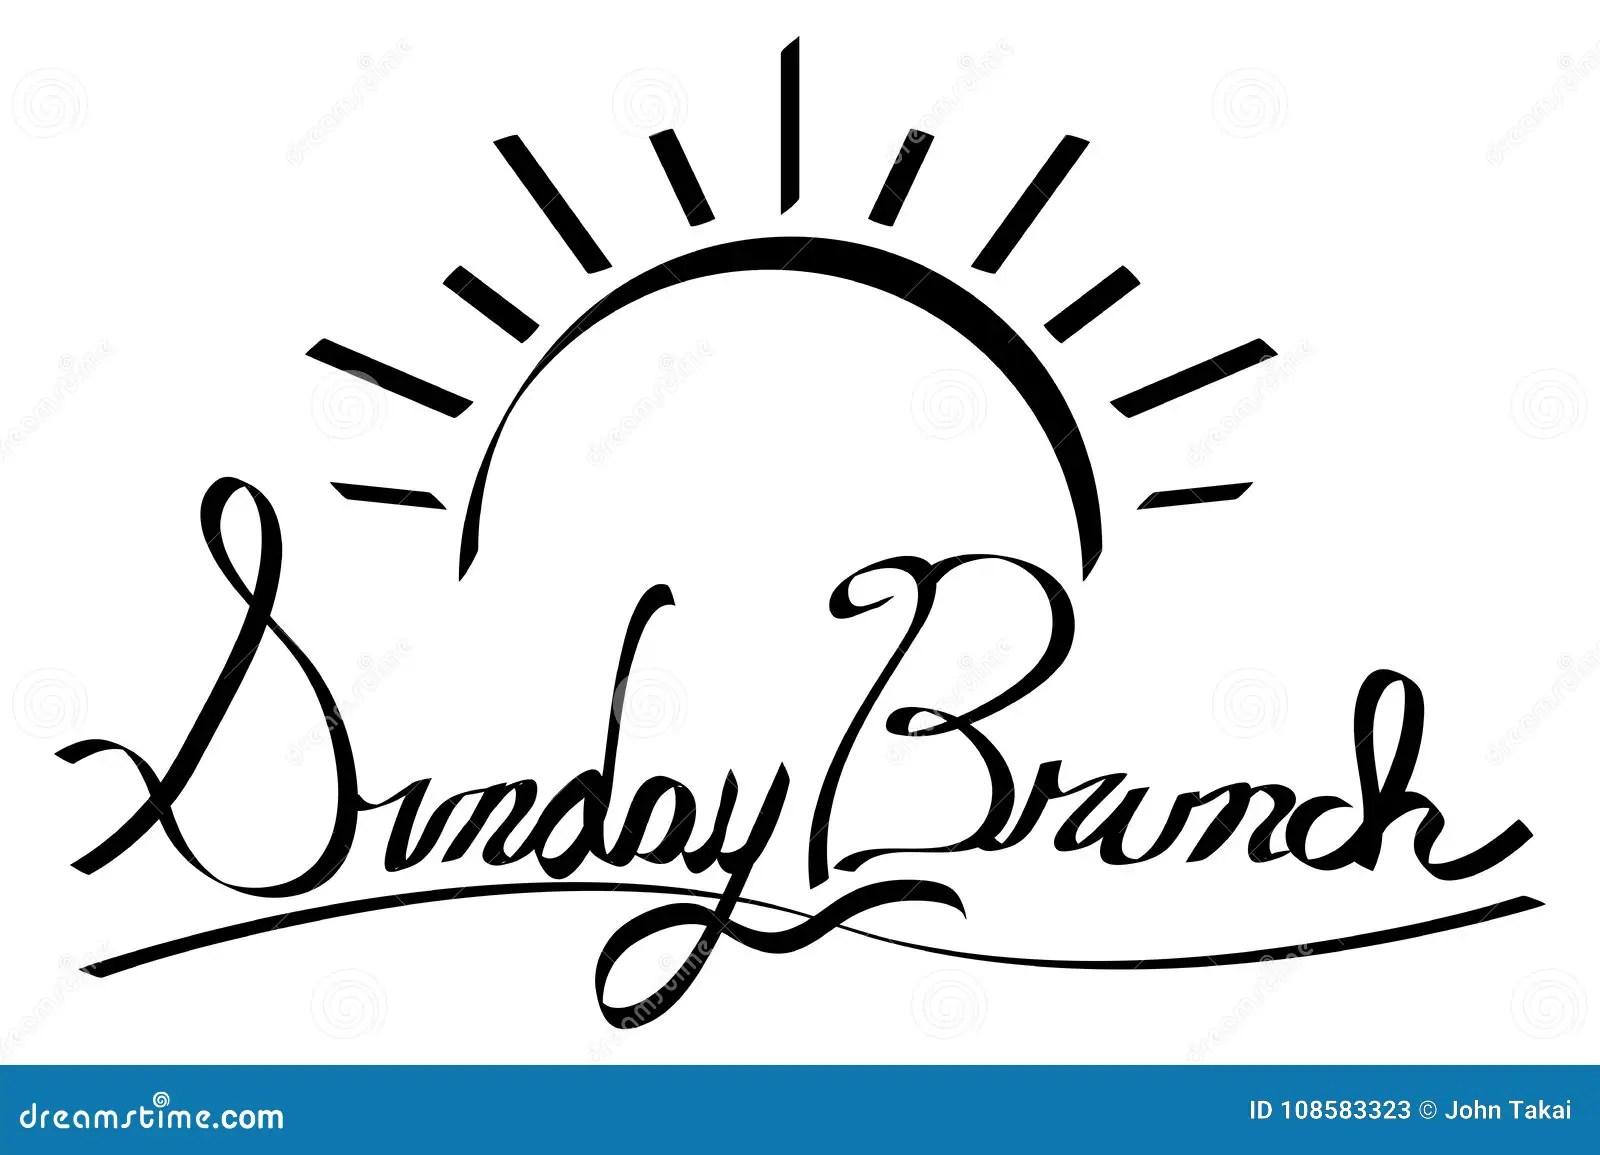 Sunrise Sunday Brunch Calligraphy Handwriting Stock Vector